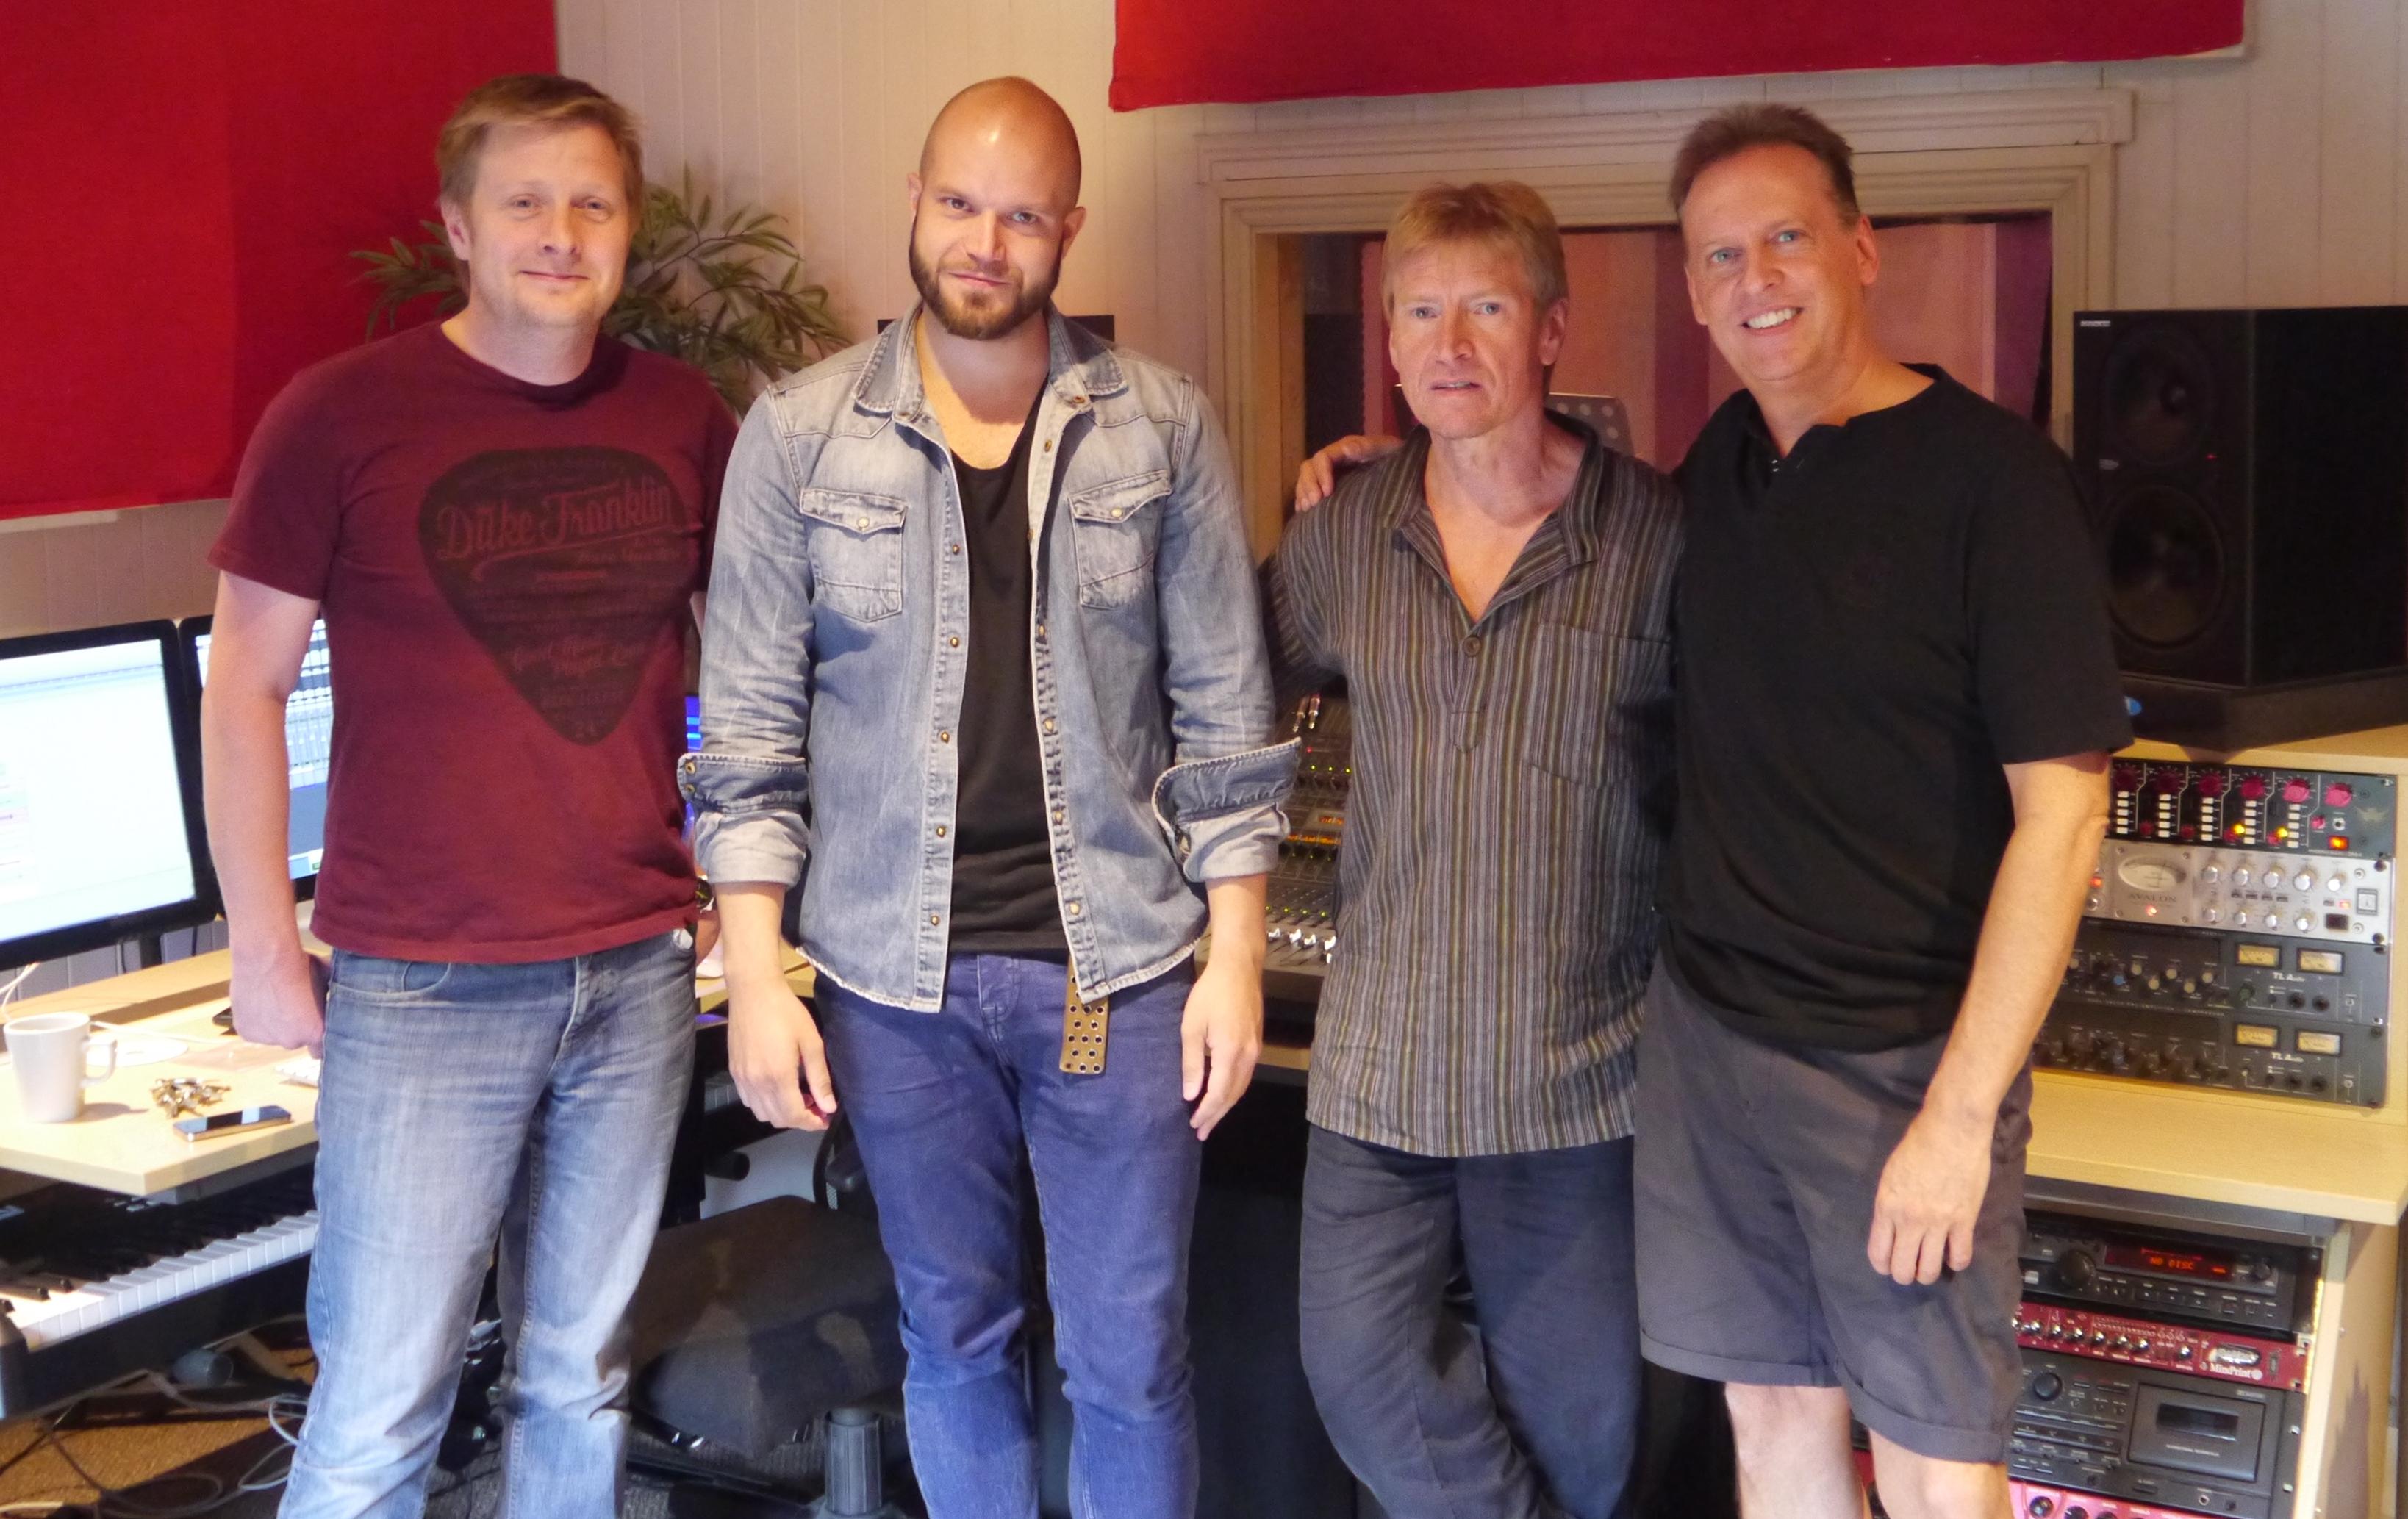 Att Skrs Cluny Studios with Tony Davis, Paul Liddell, Stu Haikney